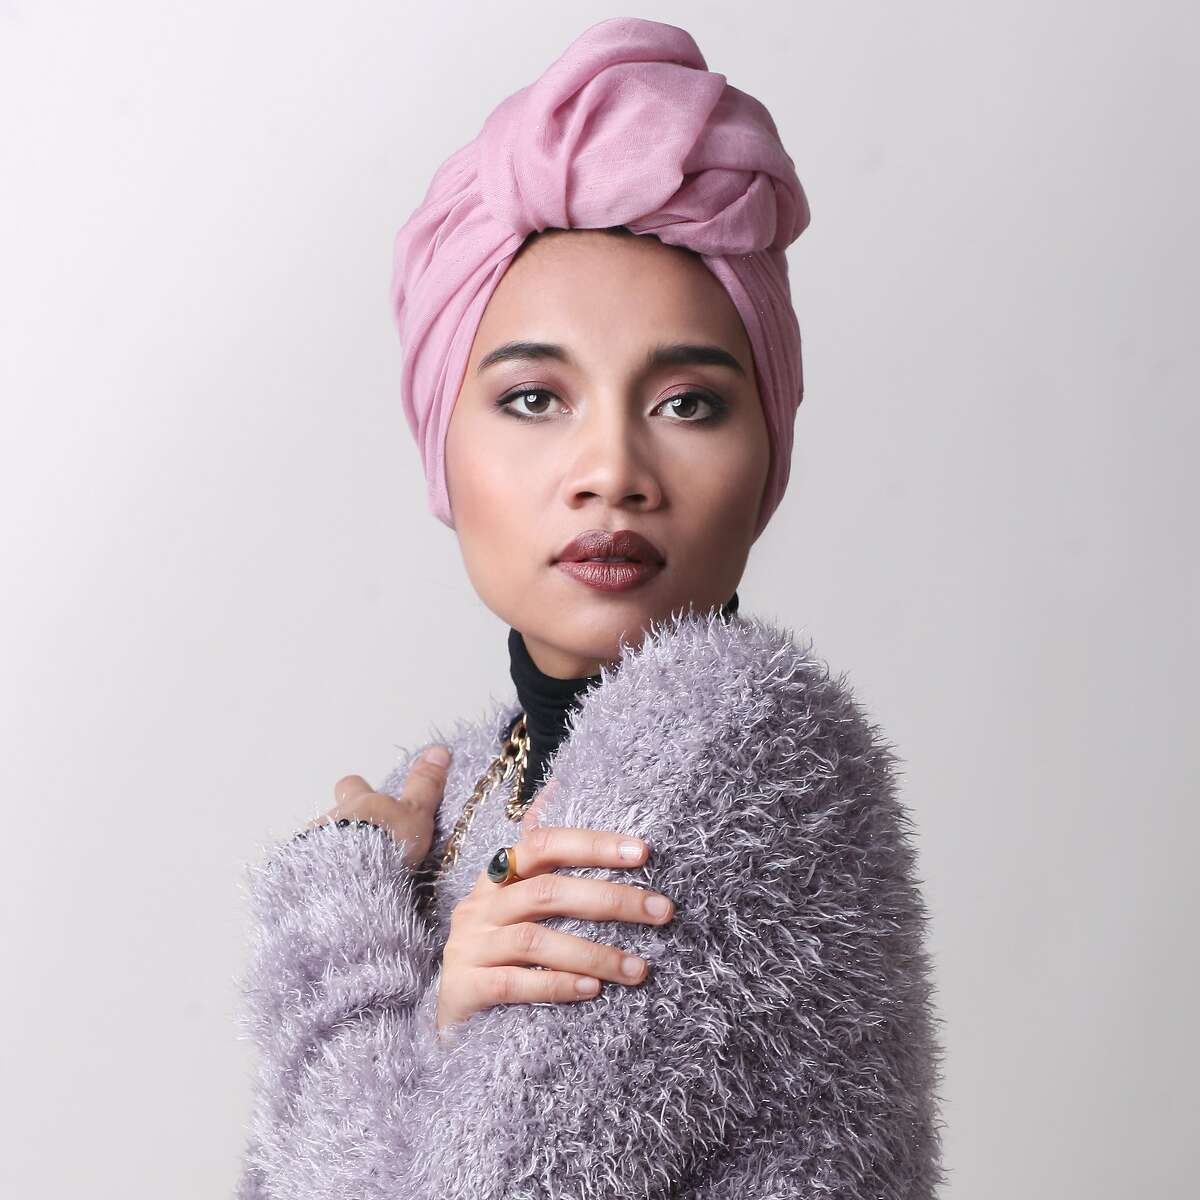 Malaysian pop star Yuna's latest album is 'Chapters'